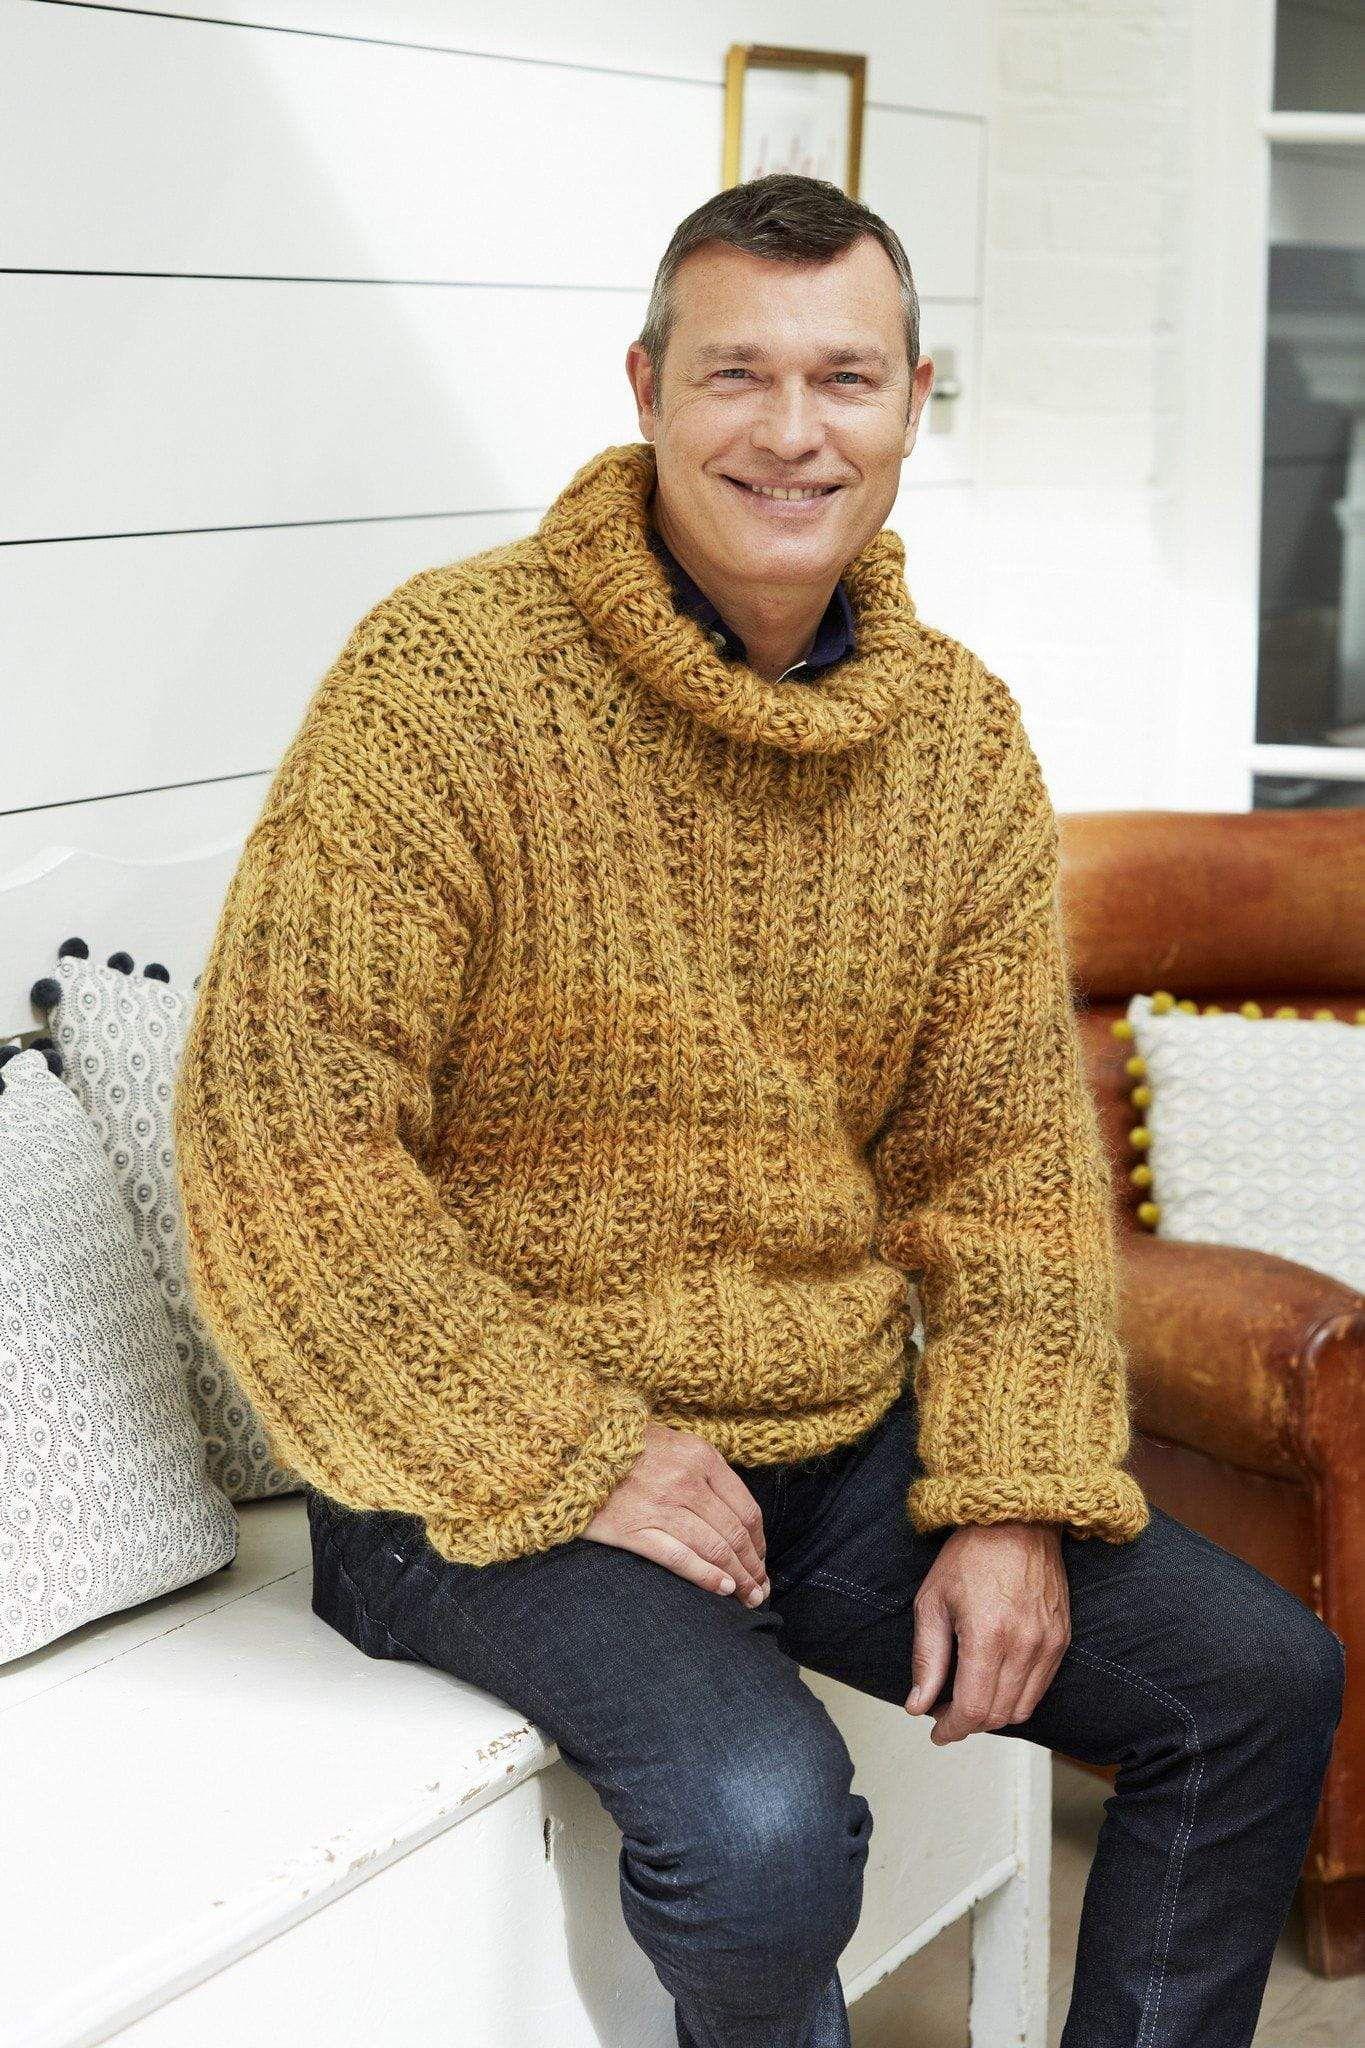 Mens Classic Chunky Rib Sweater Knitting Pattern | The ...